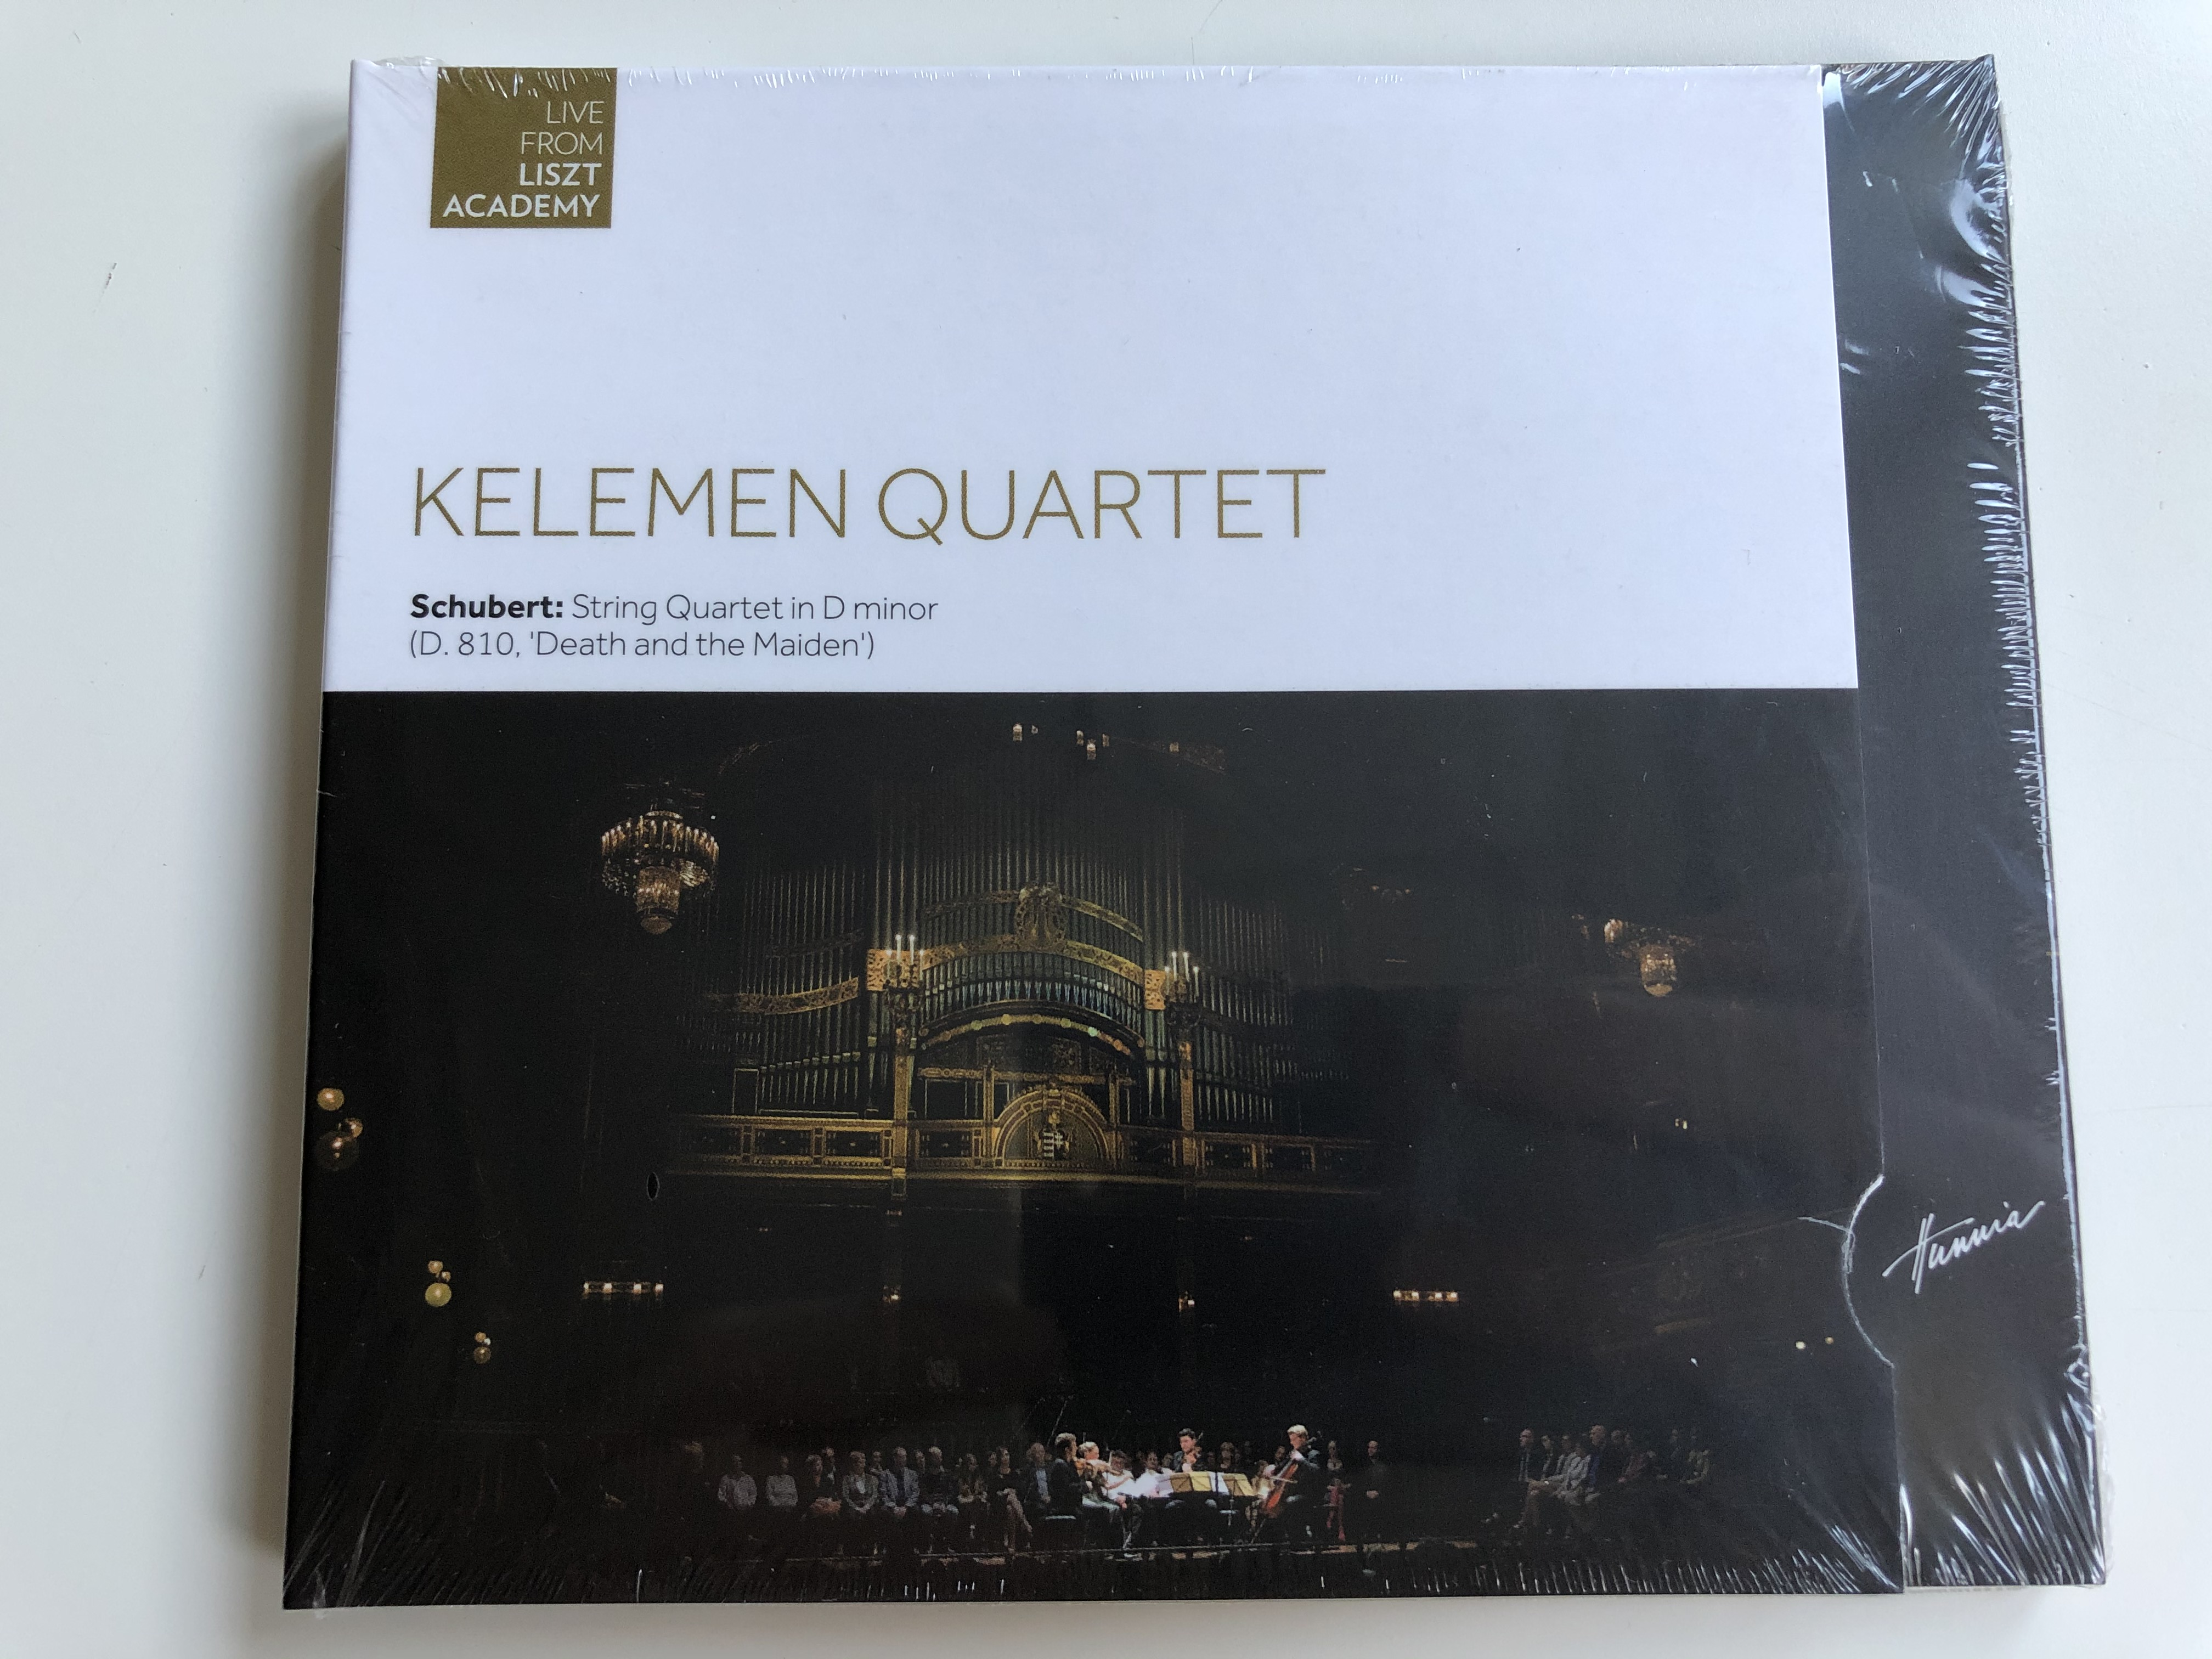 kelemen-quartet-schubert-string-quartet-in-d-minor-d.-810-death-and-the-maiden-live-from-liszt-academy-hunnia-records-film-production-audio-cd-2015-hrcd-1518-1-.jpg